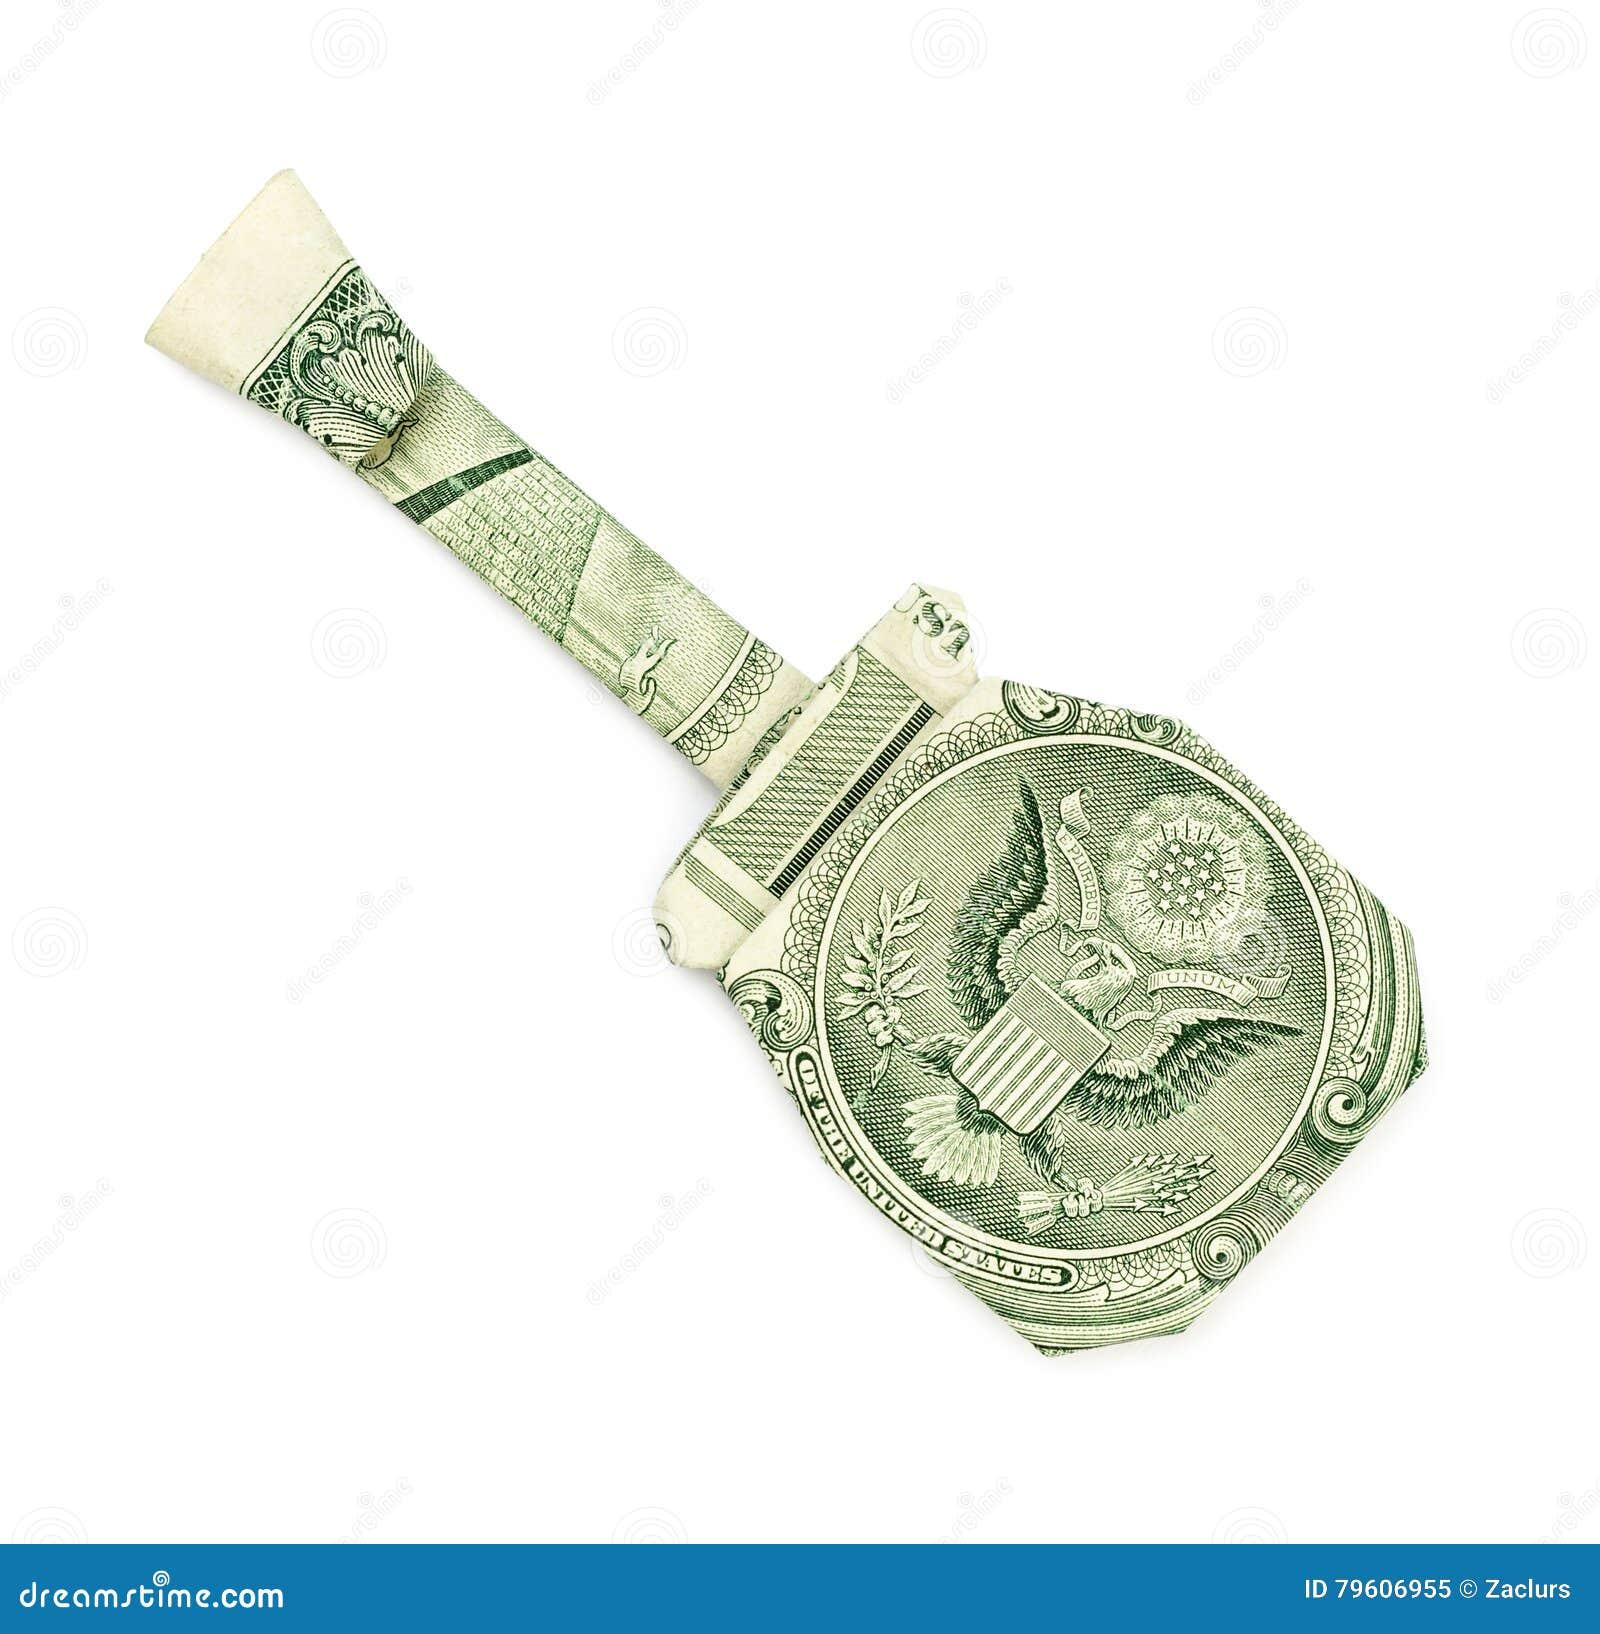 origami guitar 1 | Origami guitar, Money origami, Money origami ... | 1345x1300